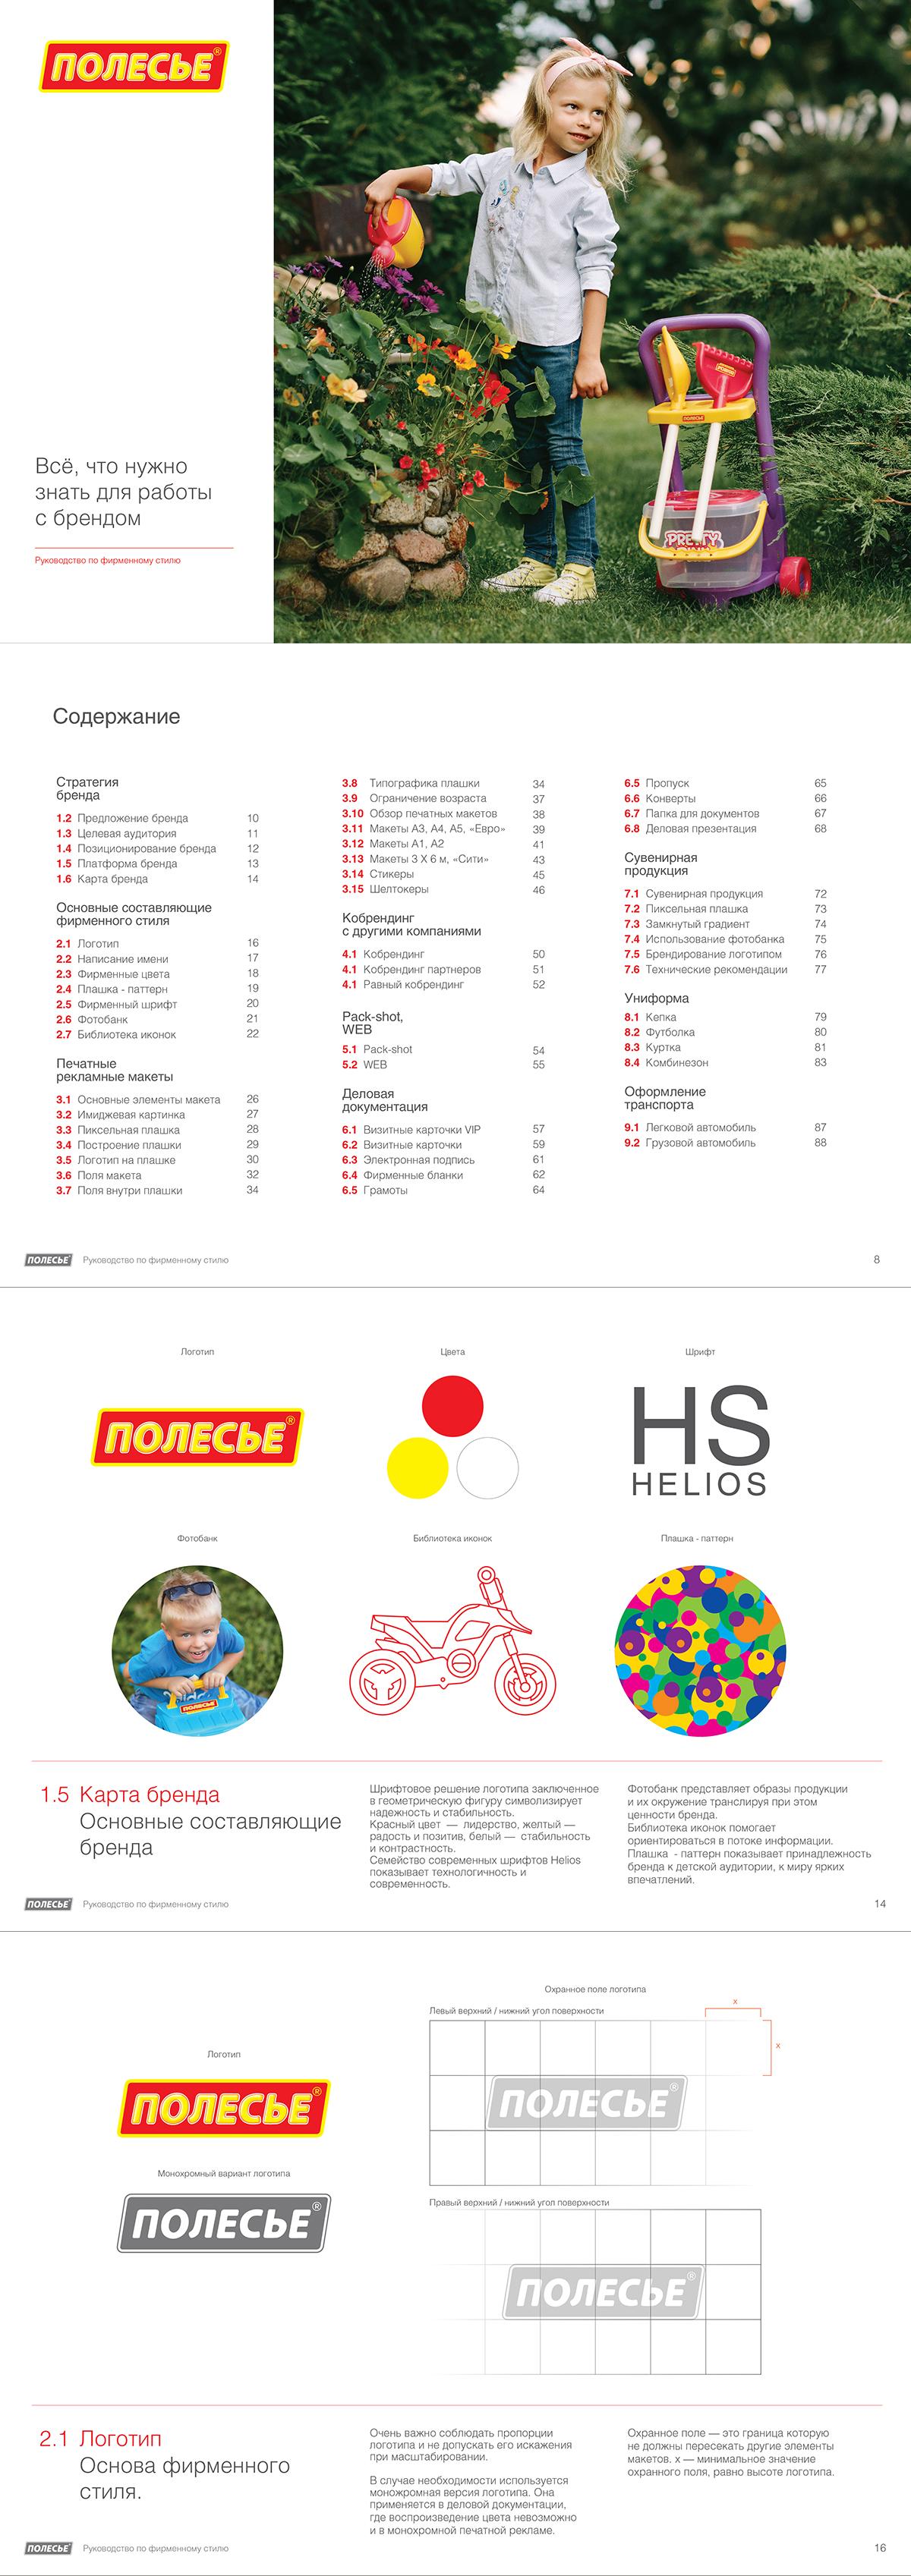 Разработка фирменного стиля на основании готового логотипа фото f_7765ac1dc7b211cb.jpg